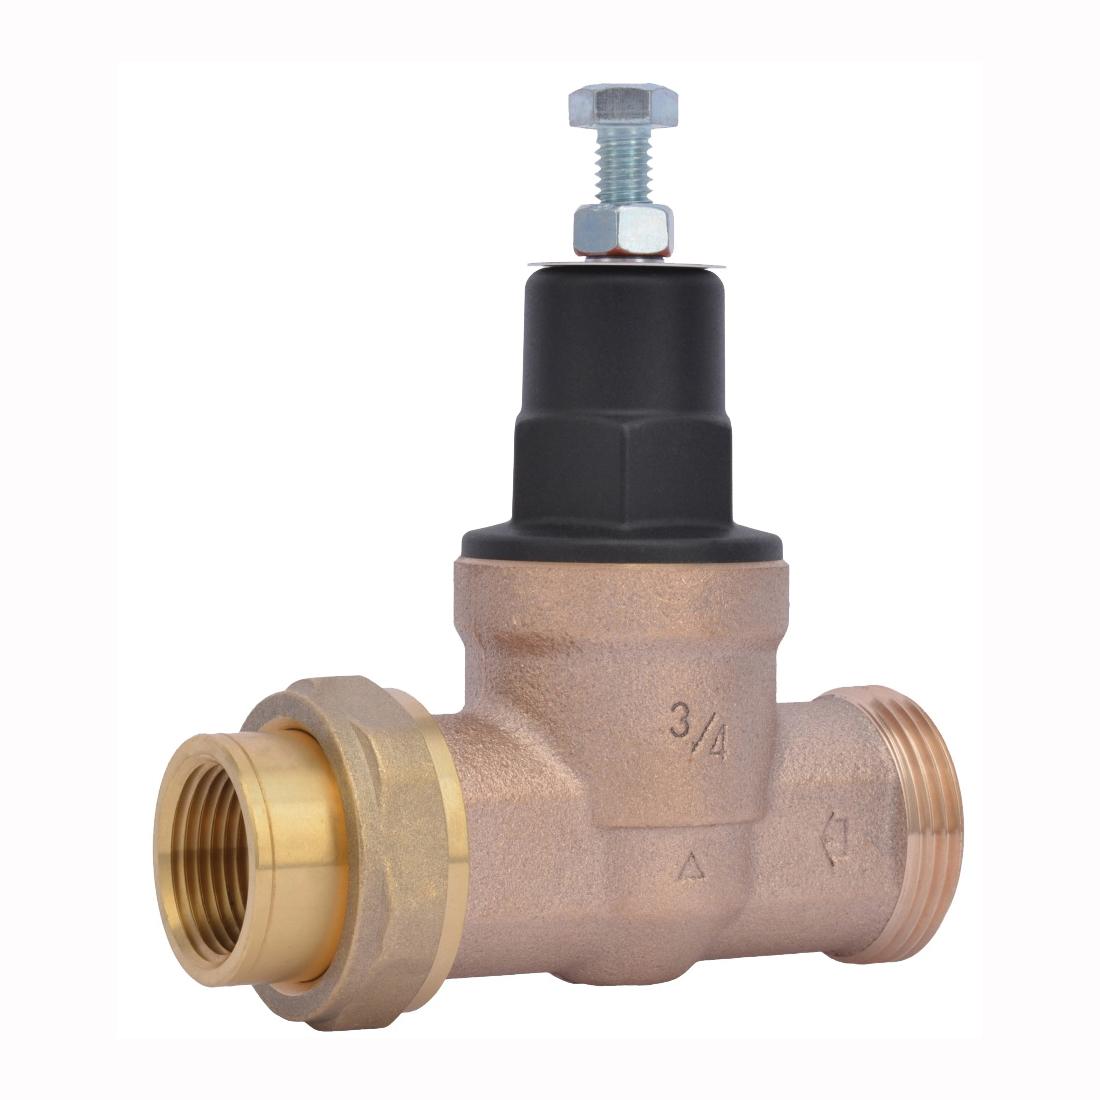 Picture of SharkBite EB45 Series 23883-0045 Pressure Regulating Valve, 3/4 in Connection, Single Union x NPT, Bronze Body